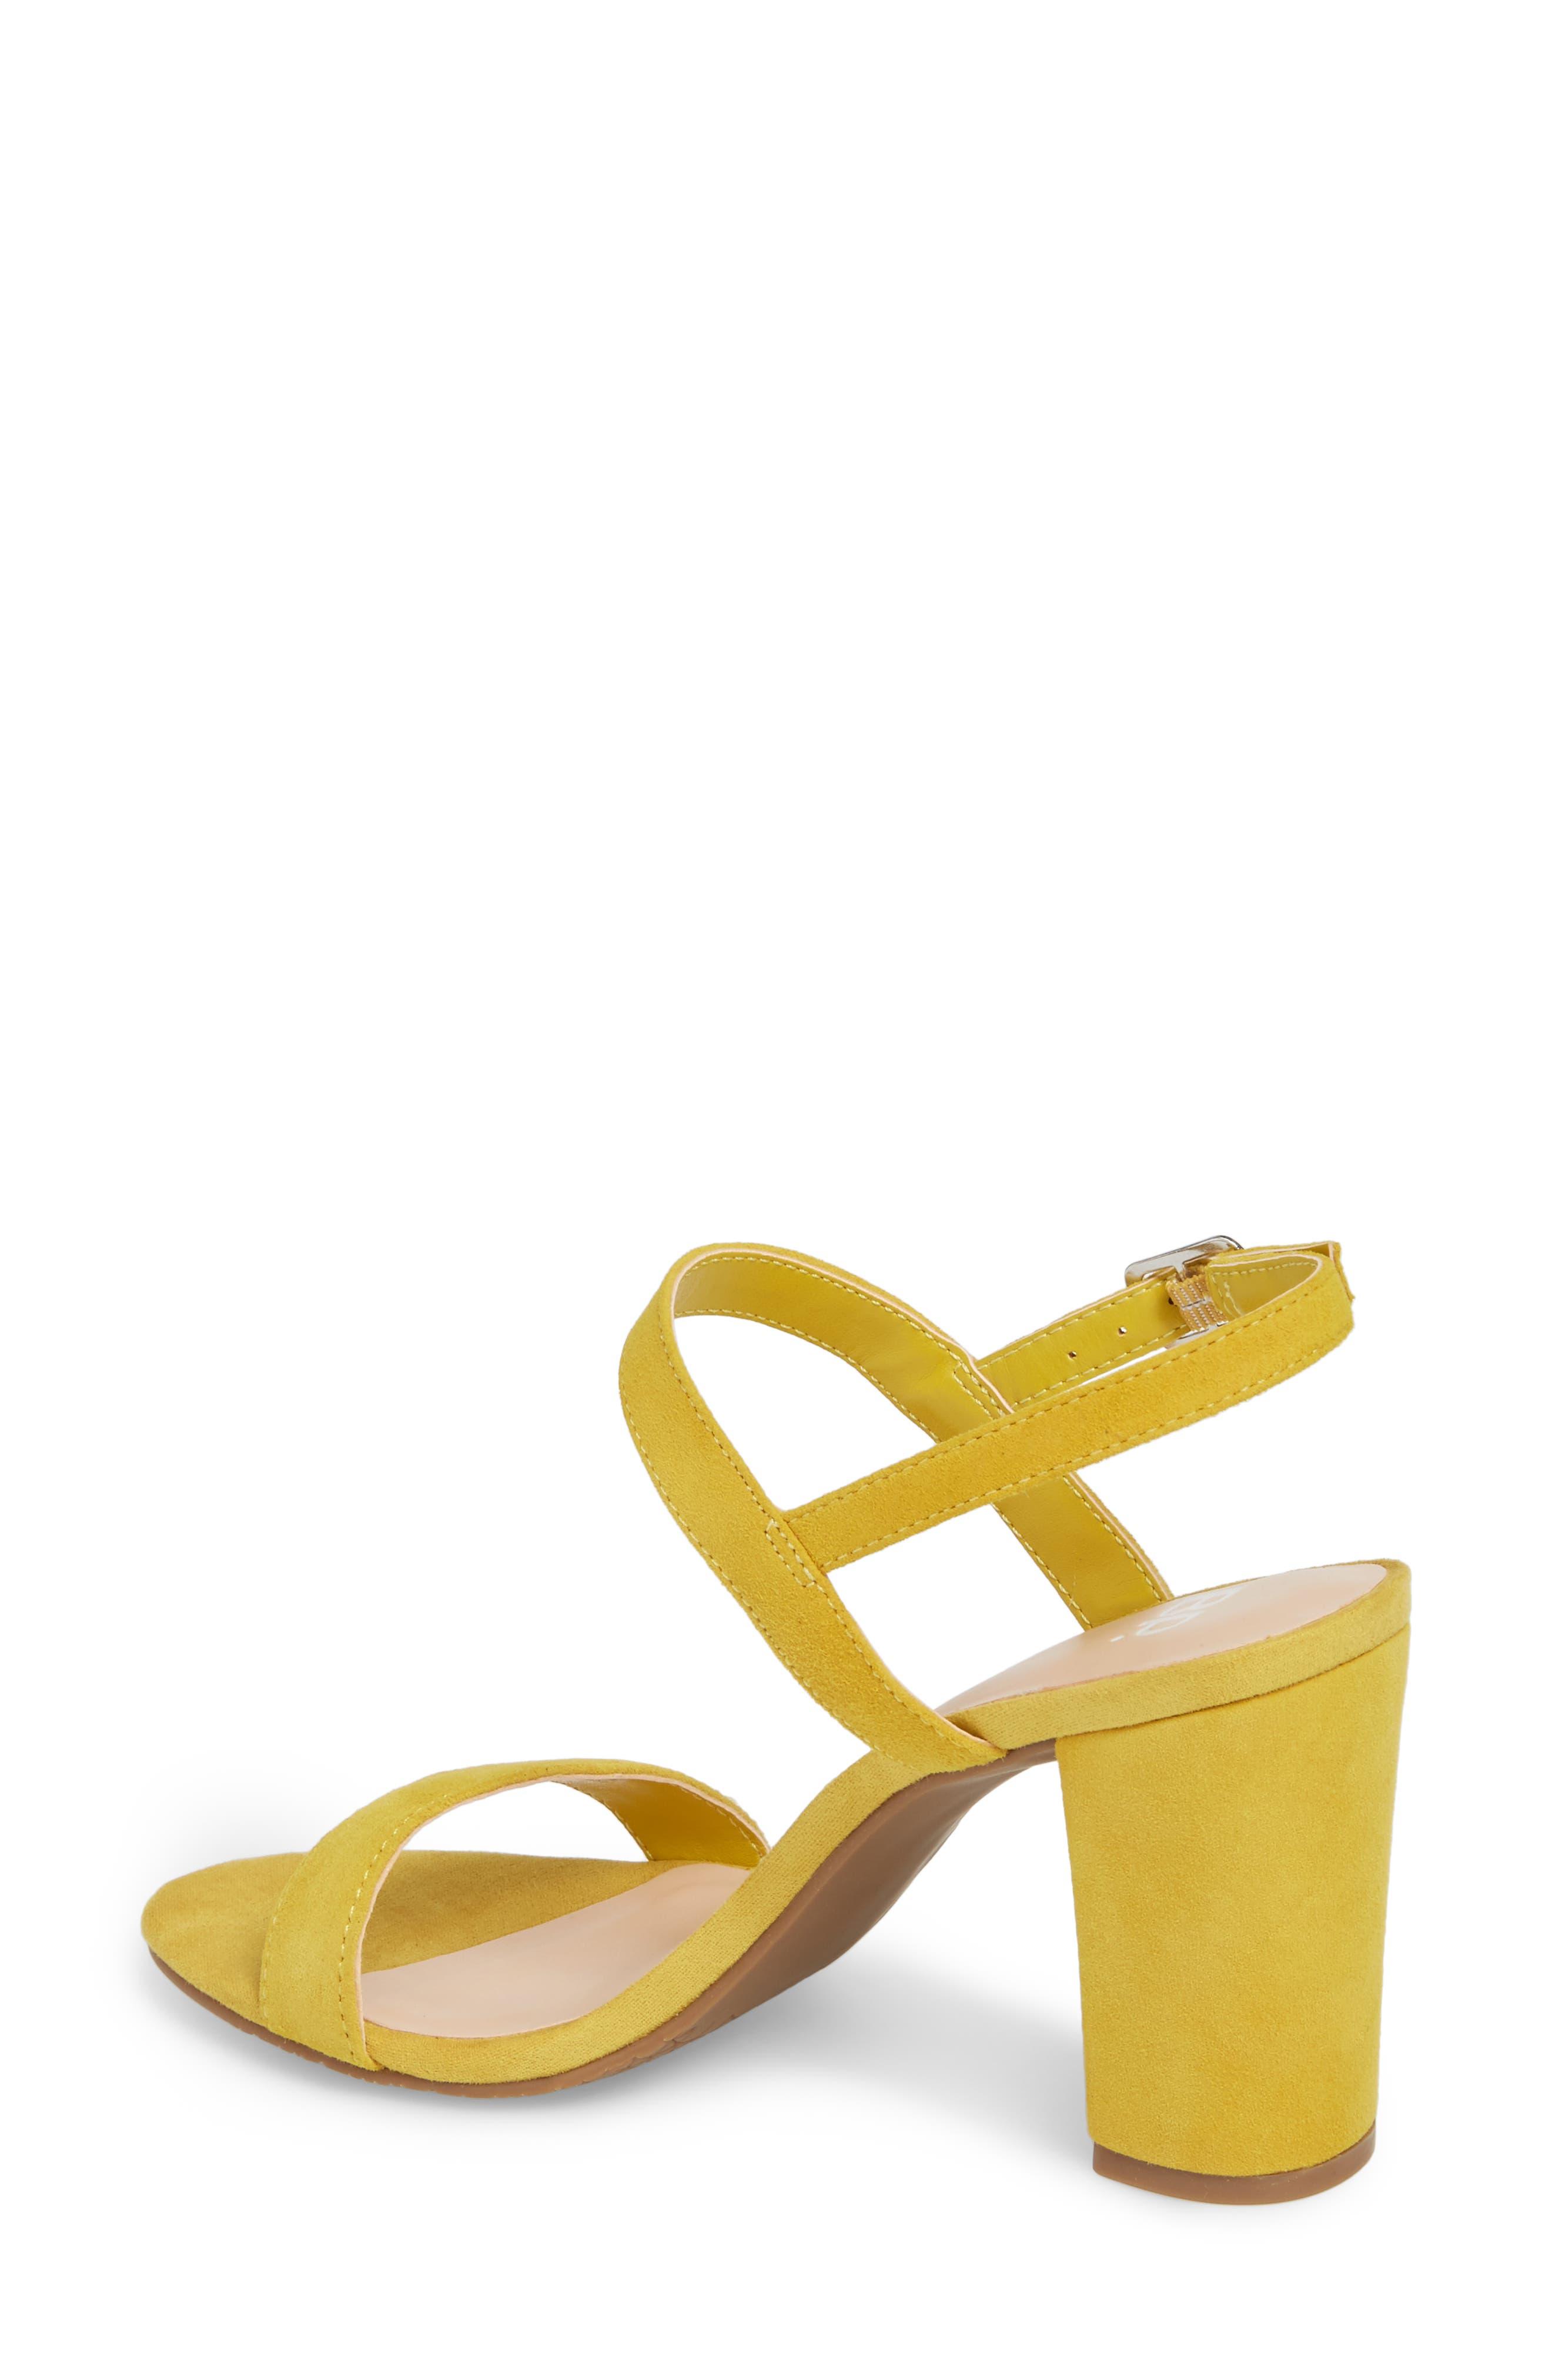 Lula Block Heel Slingback Sandal,                             Alternate thumbnail 2, color,                             Yellow Suede